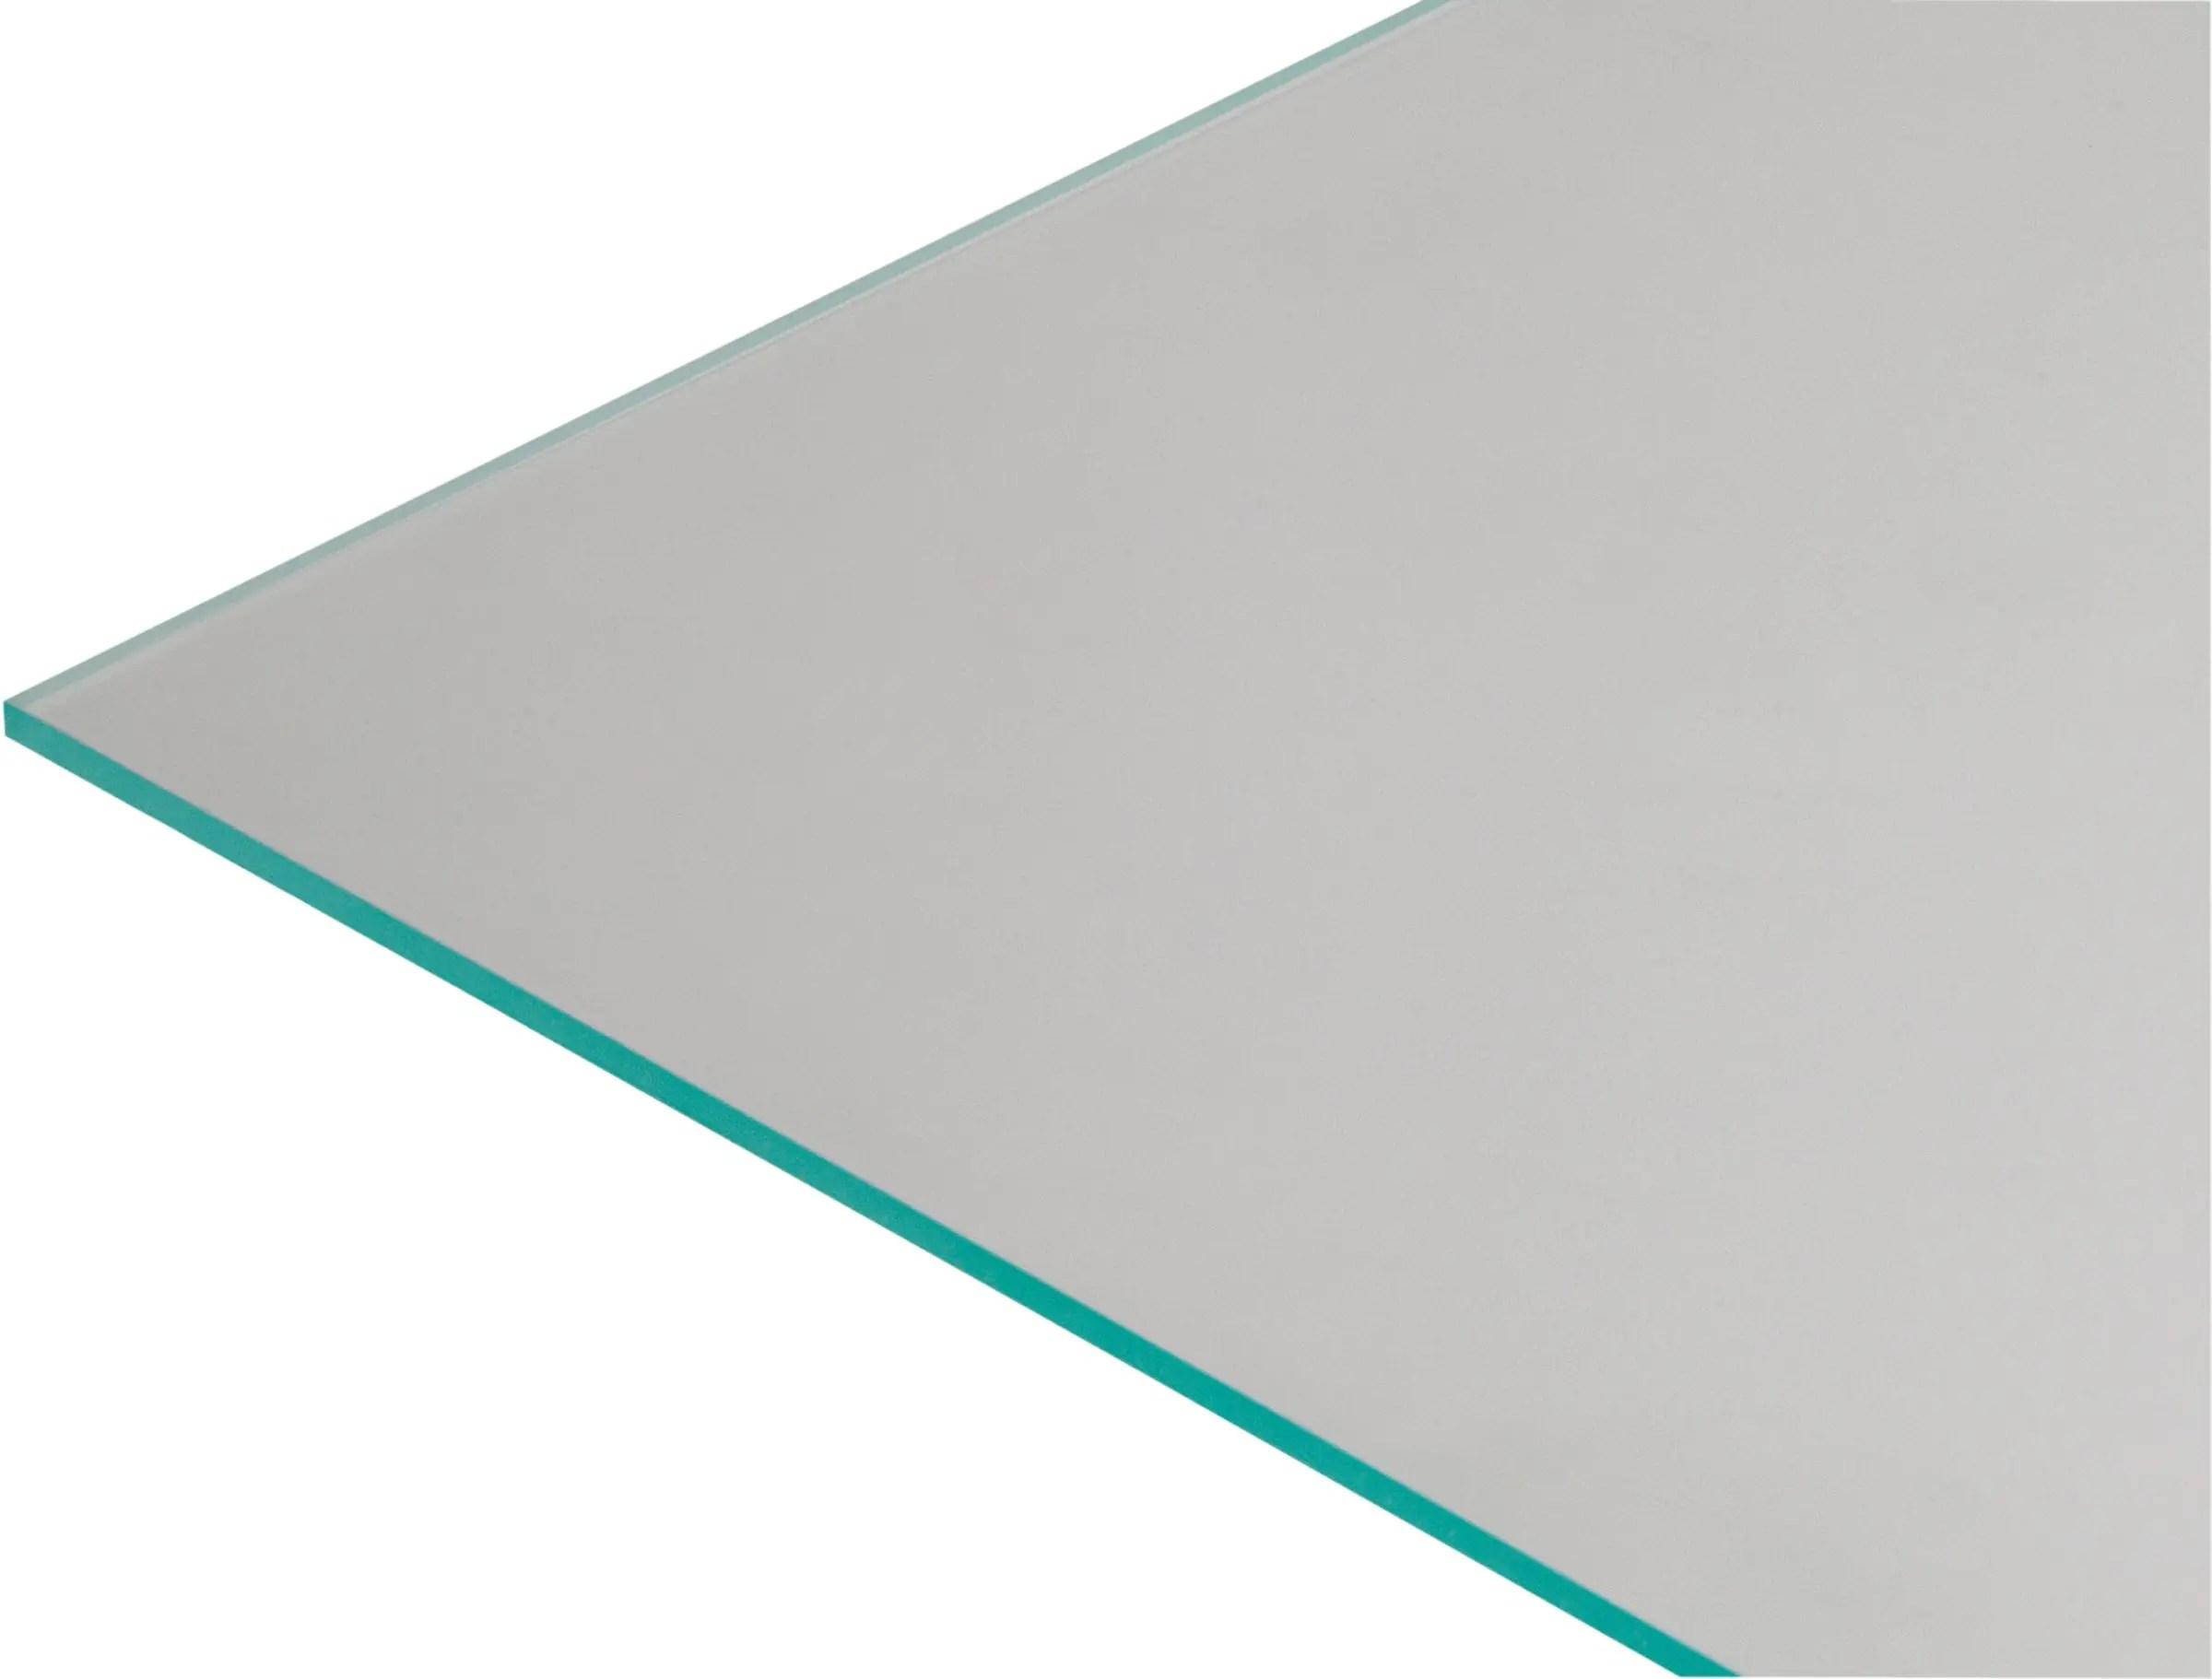 verre acrylique plat qualite extrude